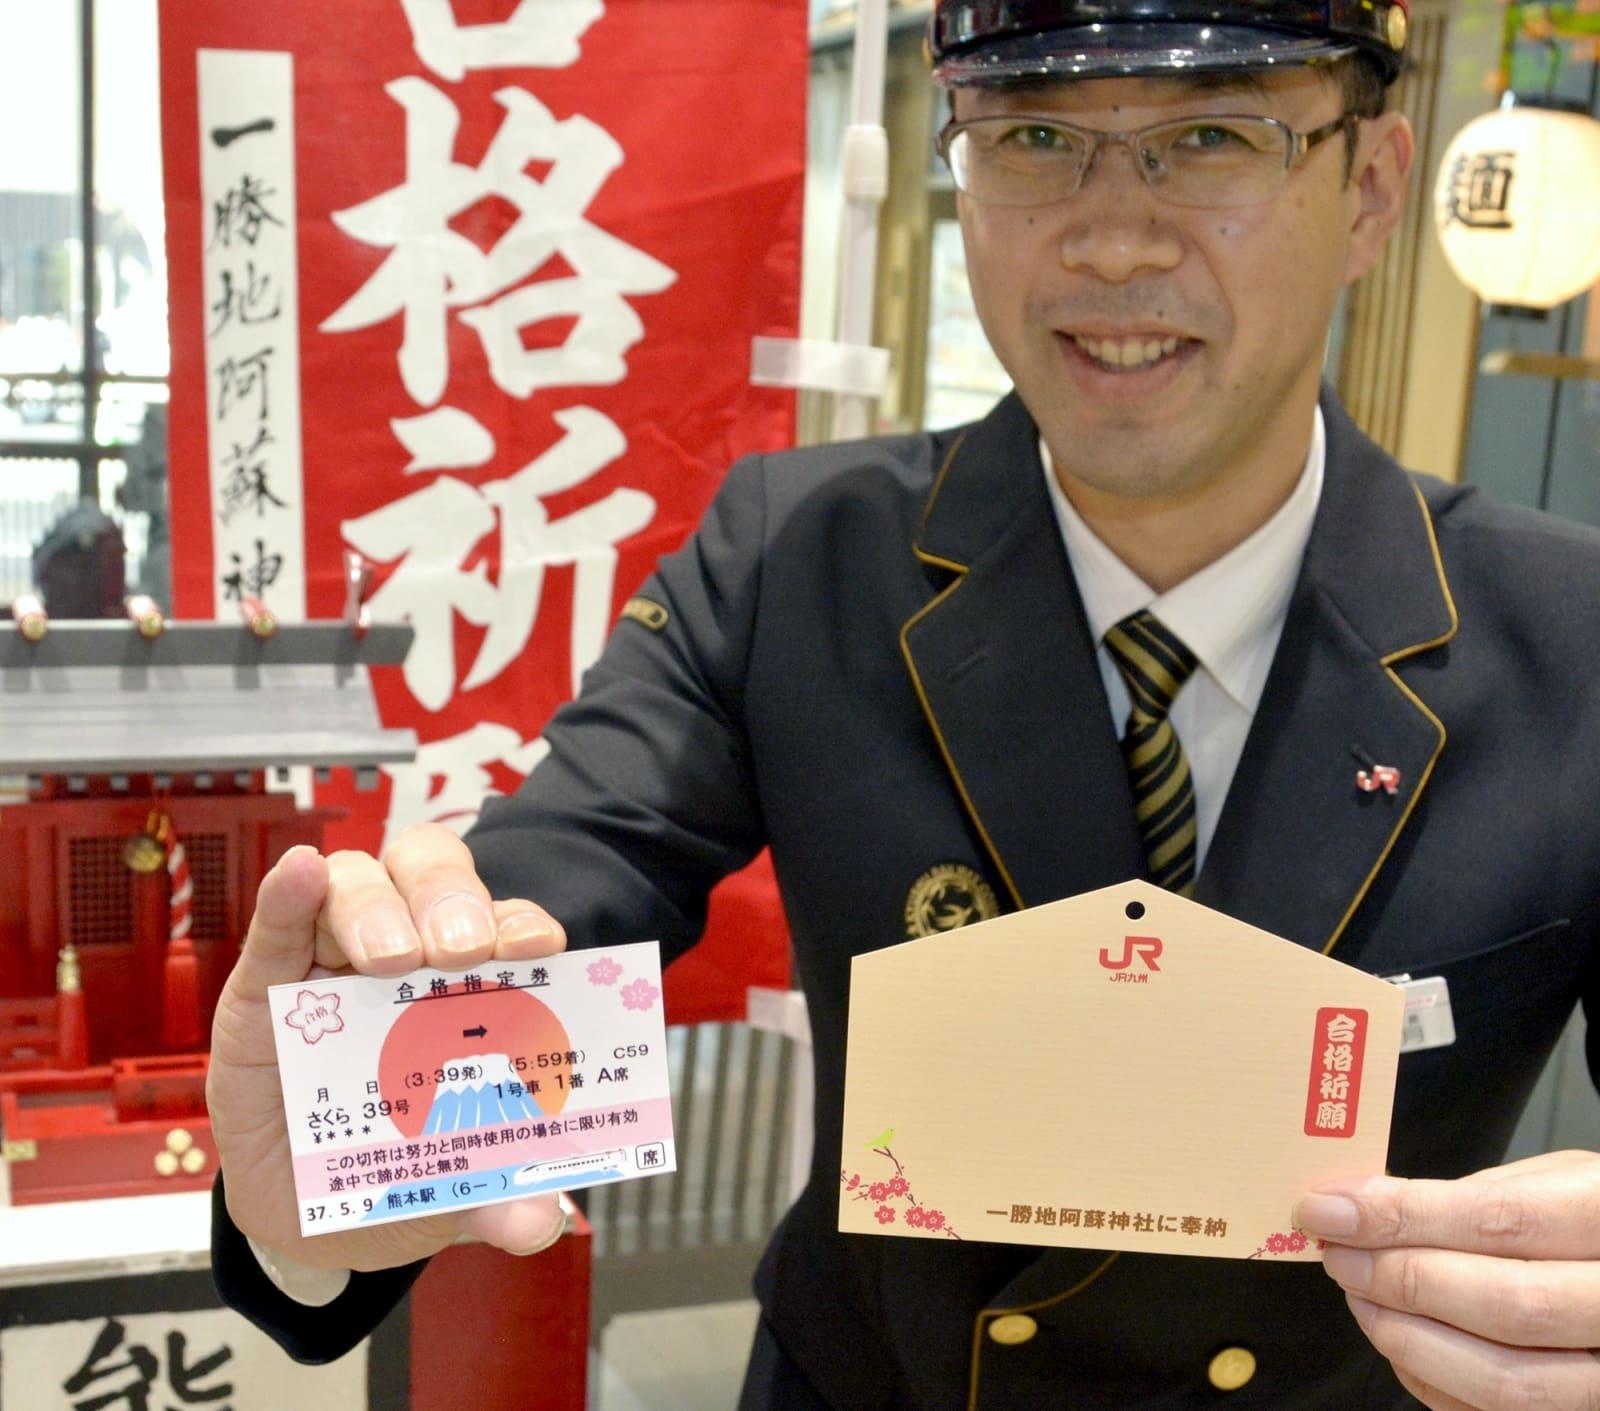 JR熊本駅で配布している合格指定券(左)と合格祈願絵馬